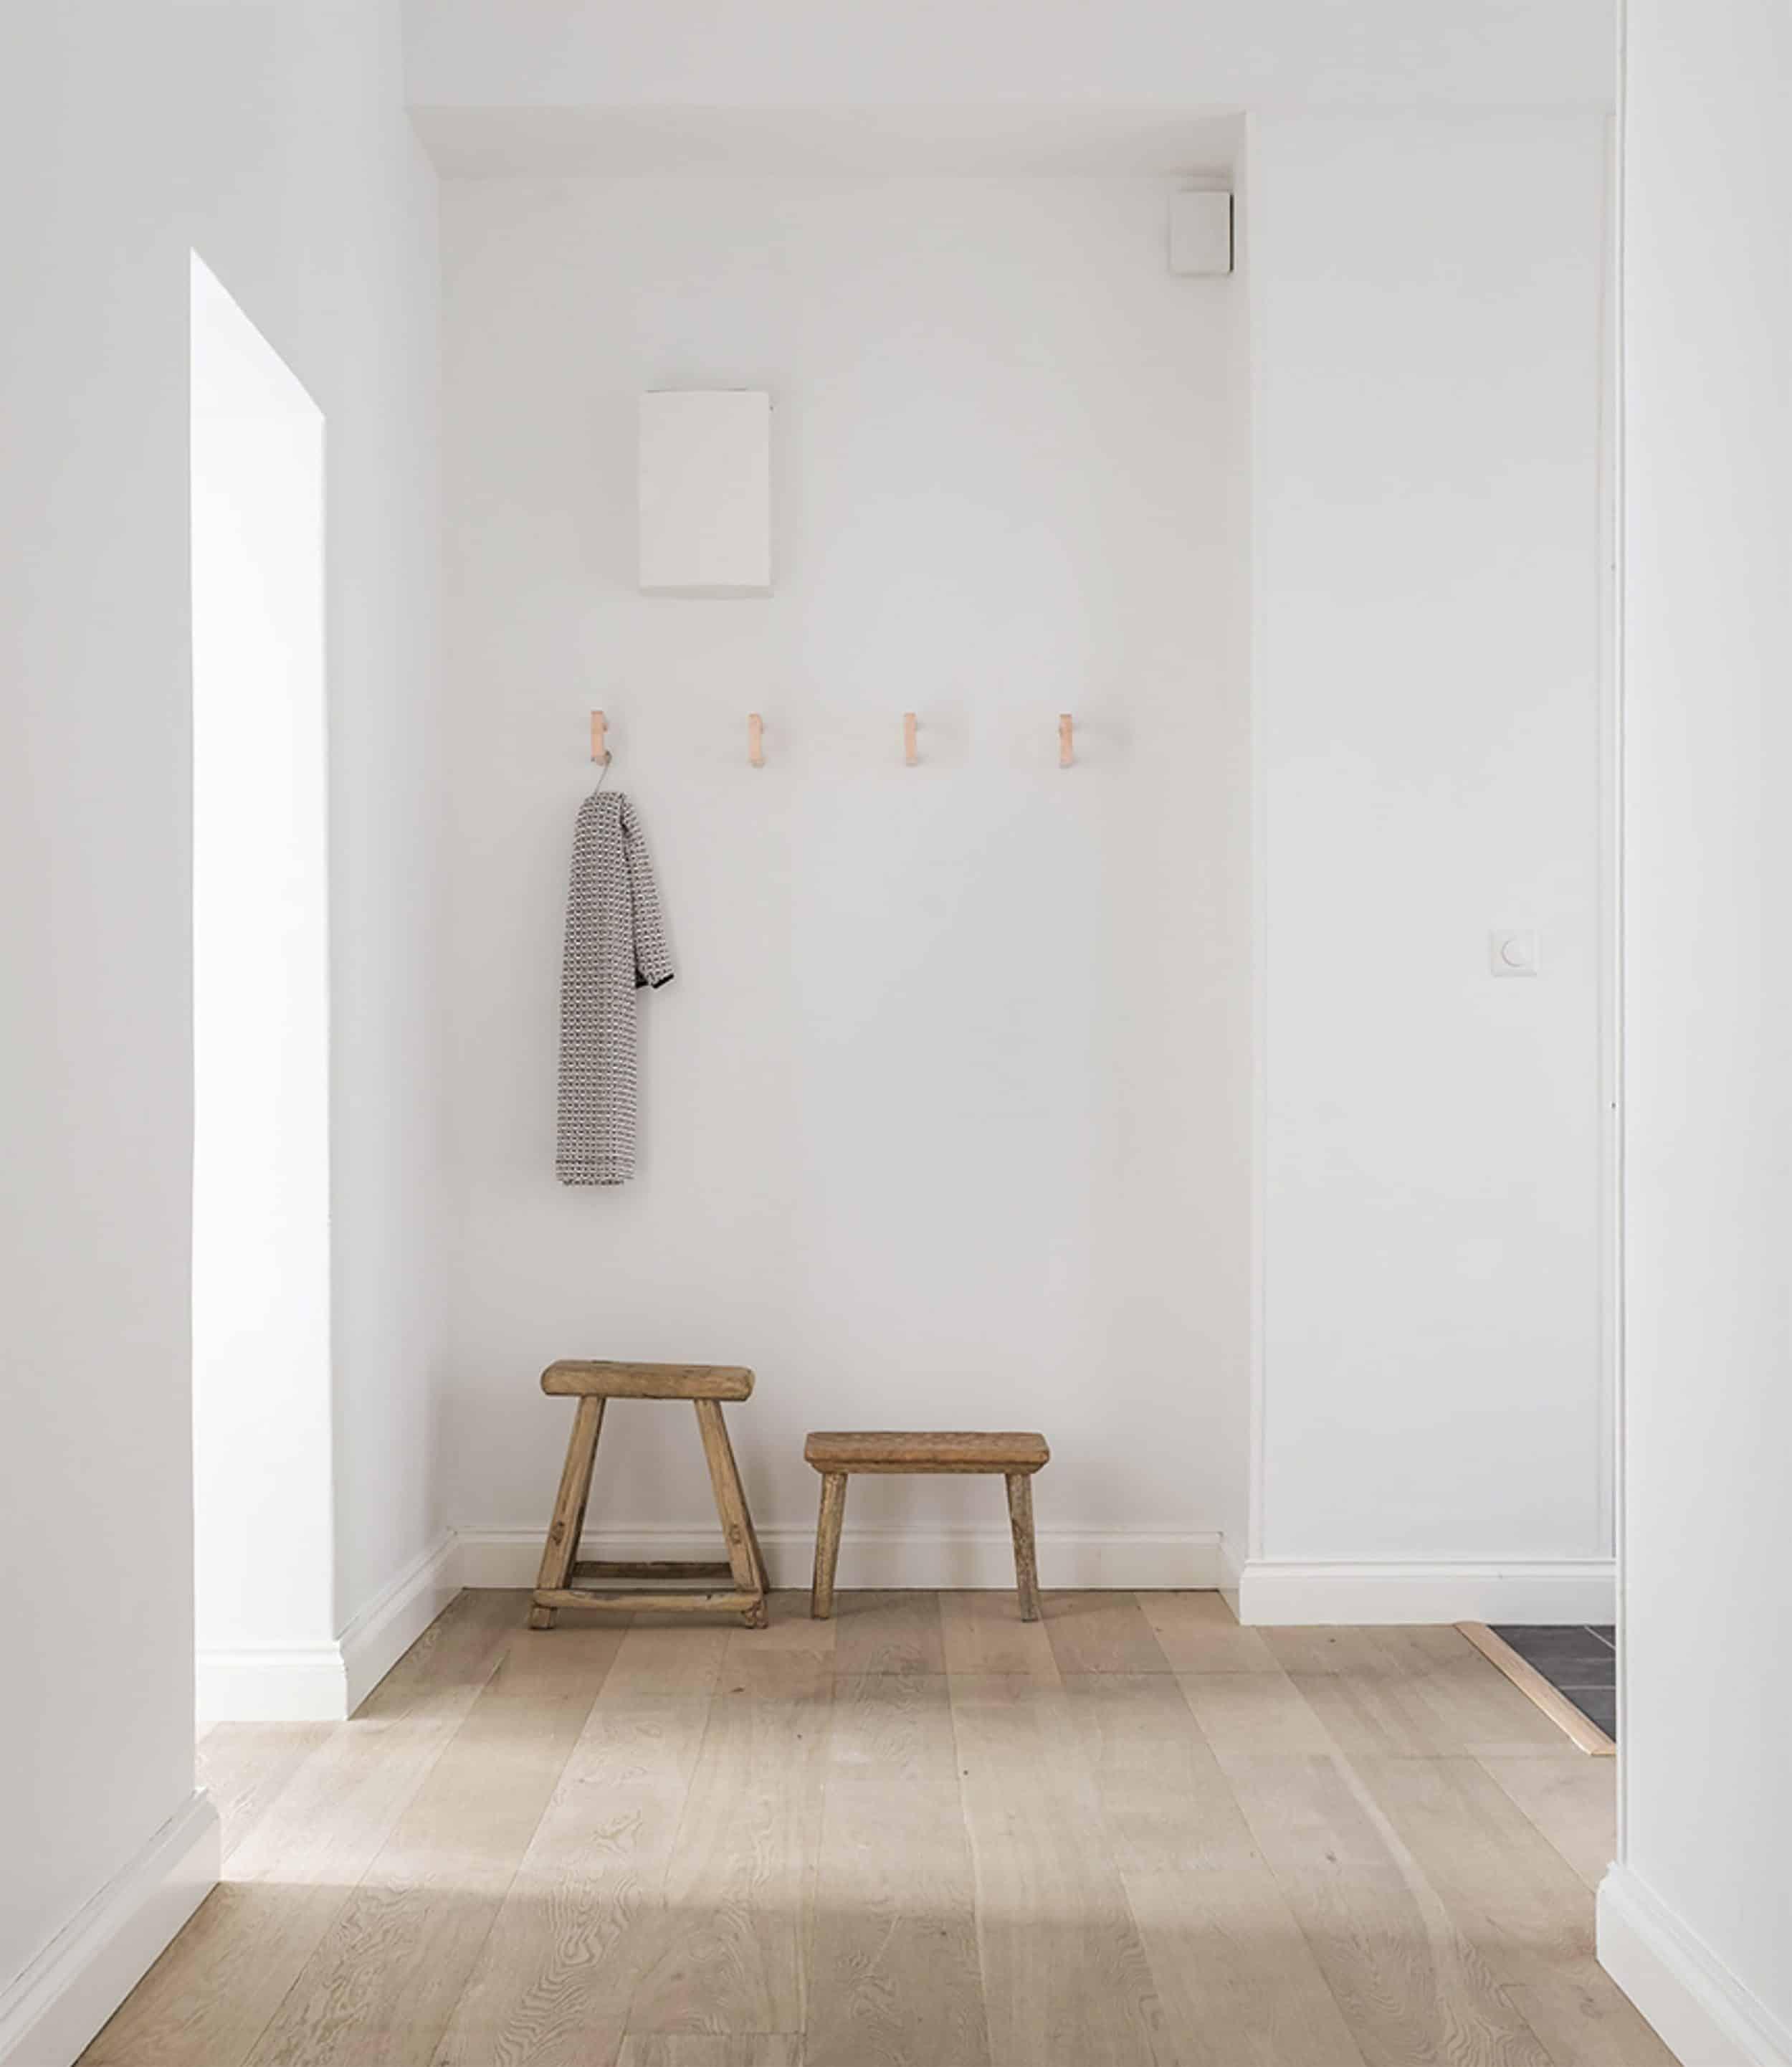 Modern Scandinavian Hallway with Rustic Stools